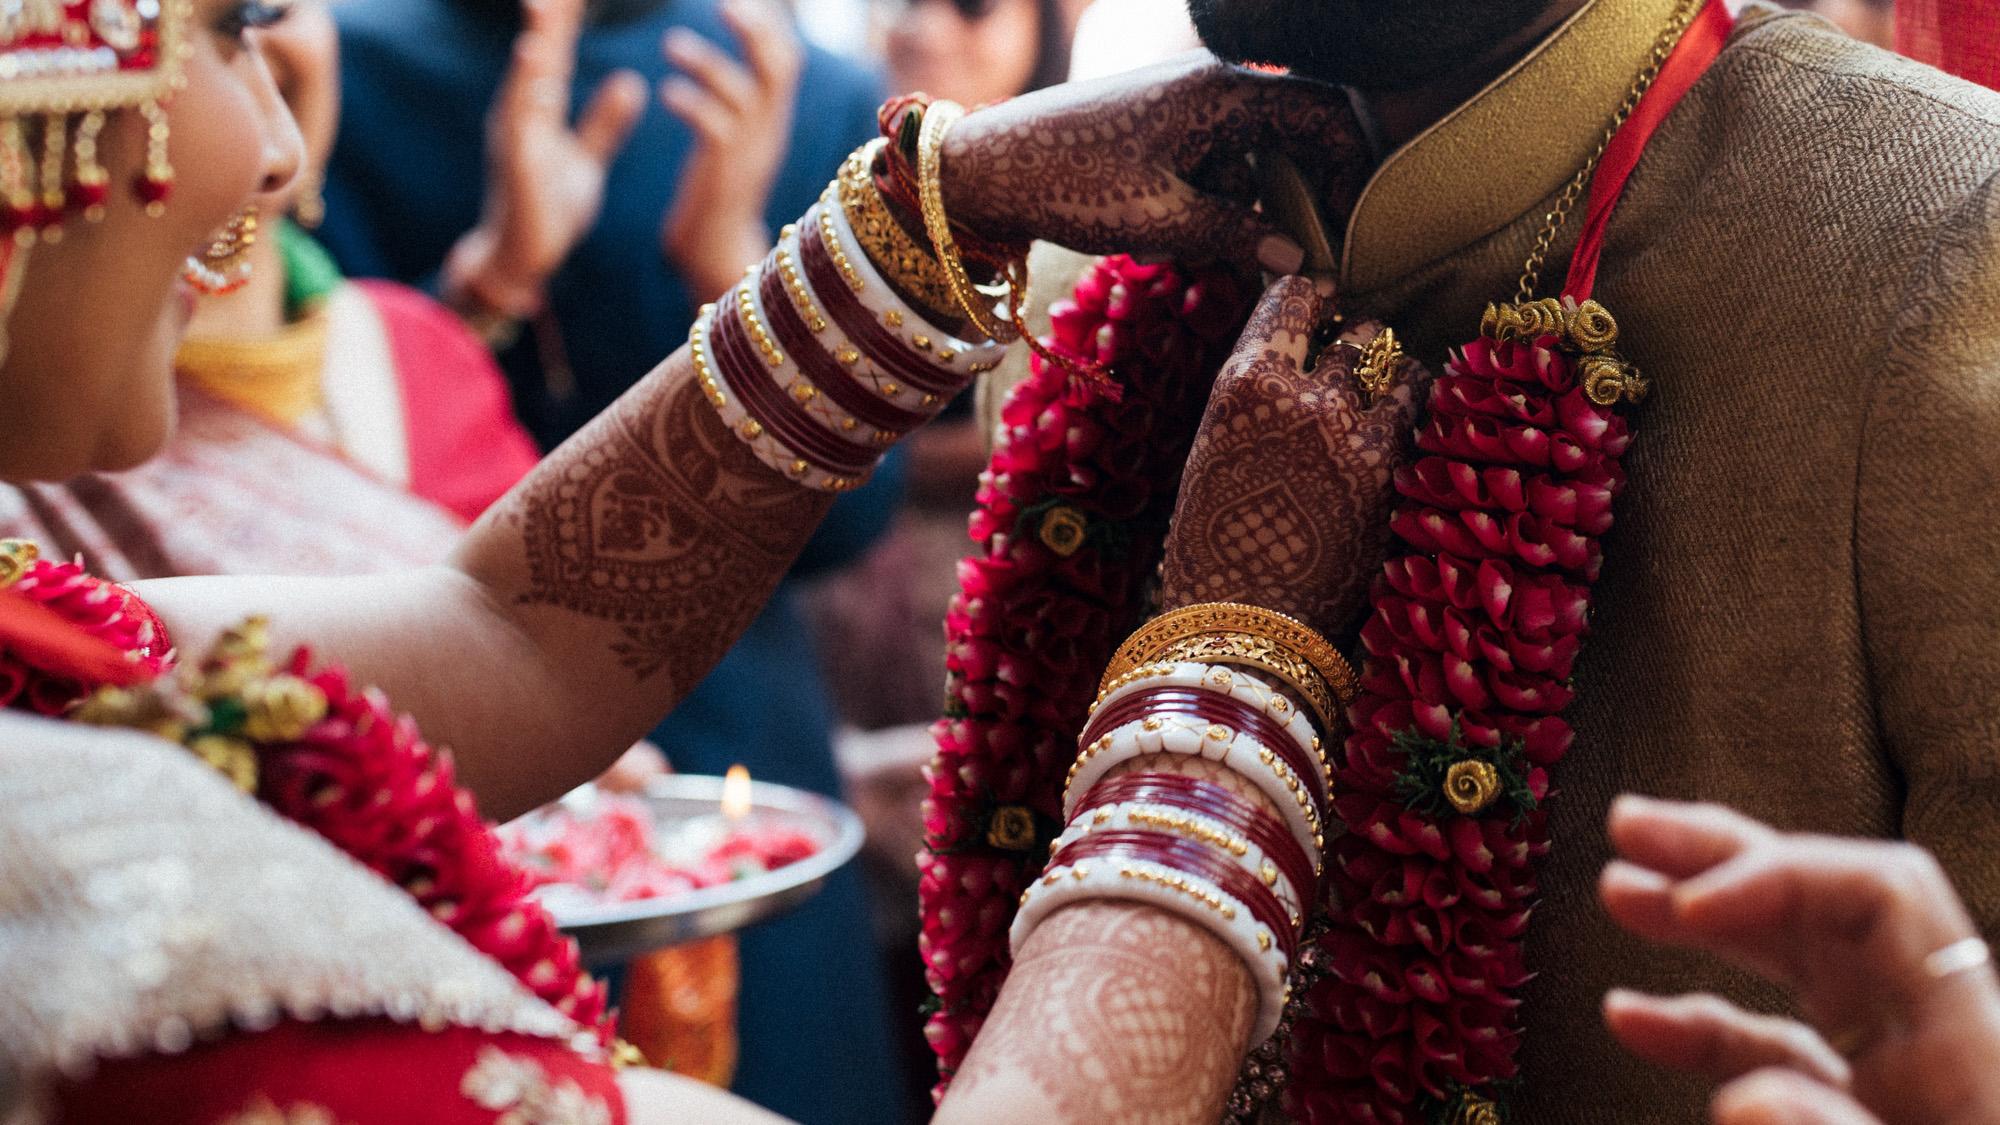 anu_maneesh_alec_vanderboom_Indian_wedding_photography-0085.jpg